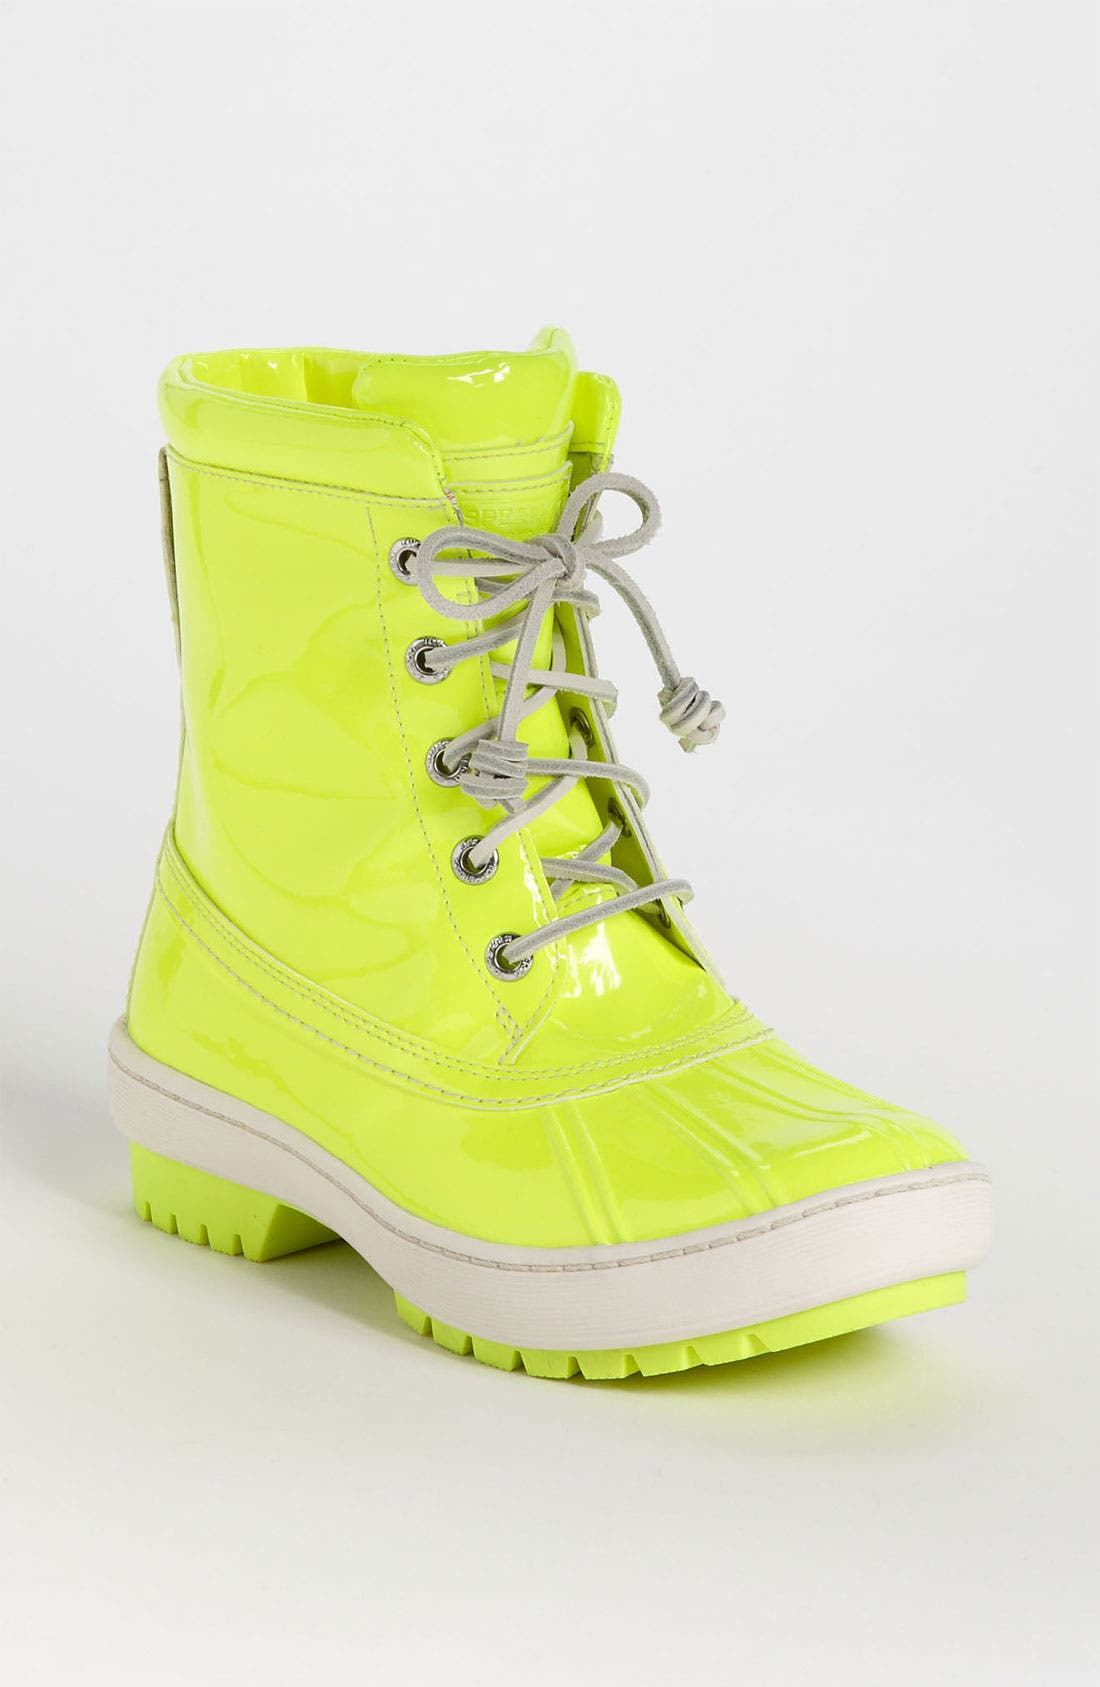 Main Image - Sperry Top-Sider® for Jeffrey 'Zermatt' Boot (Online Only)